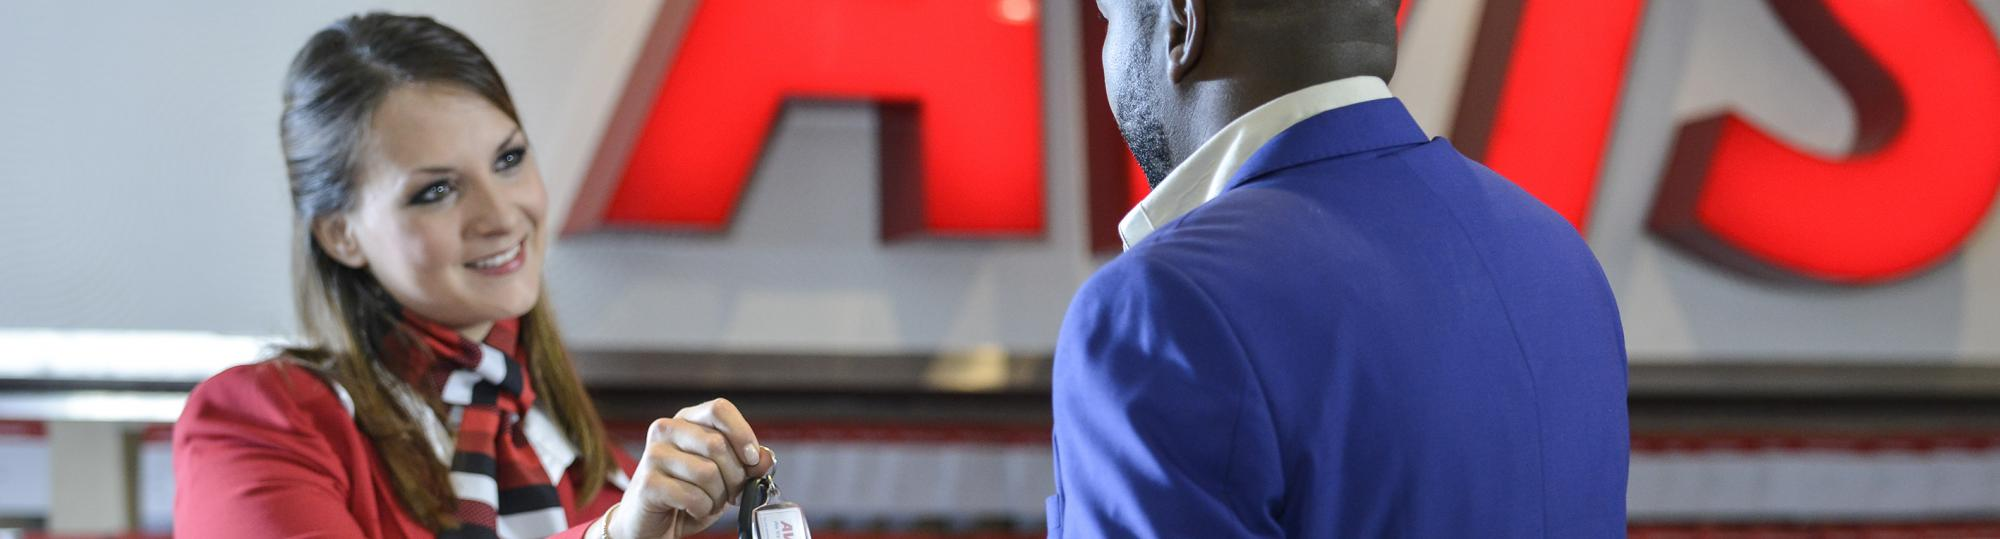 Avis Car Sales Military Discount with Veterans Advantage